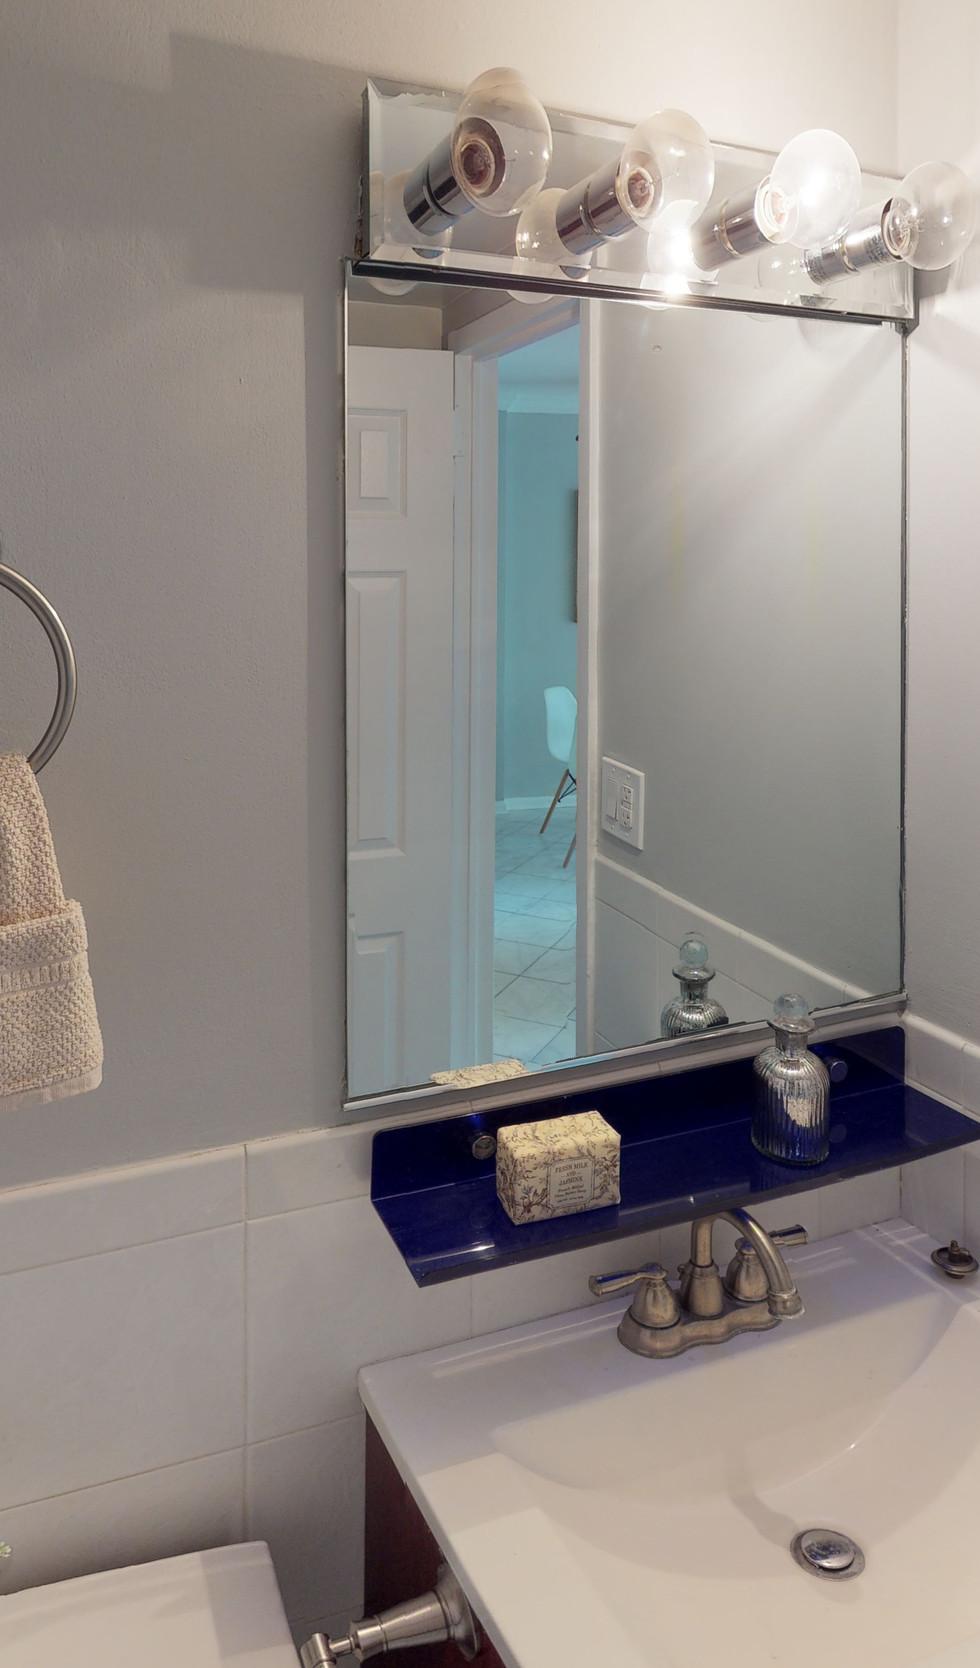 1239-Vermont-Ave-Unit-508-Bathroom.jpg